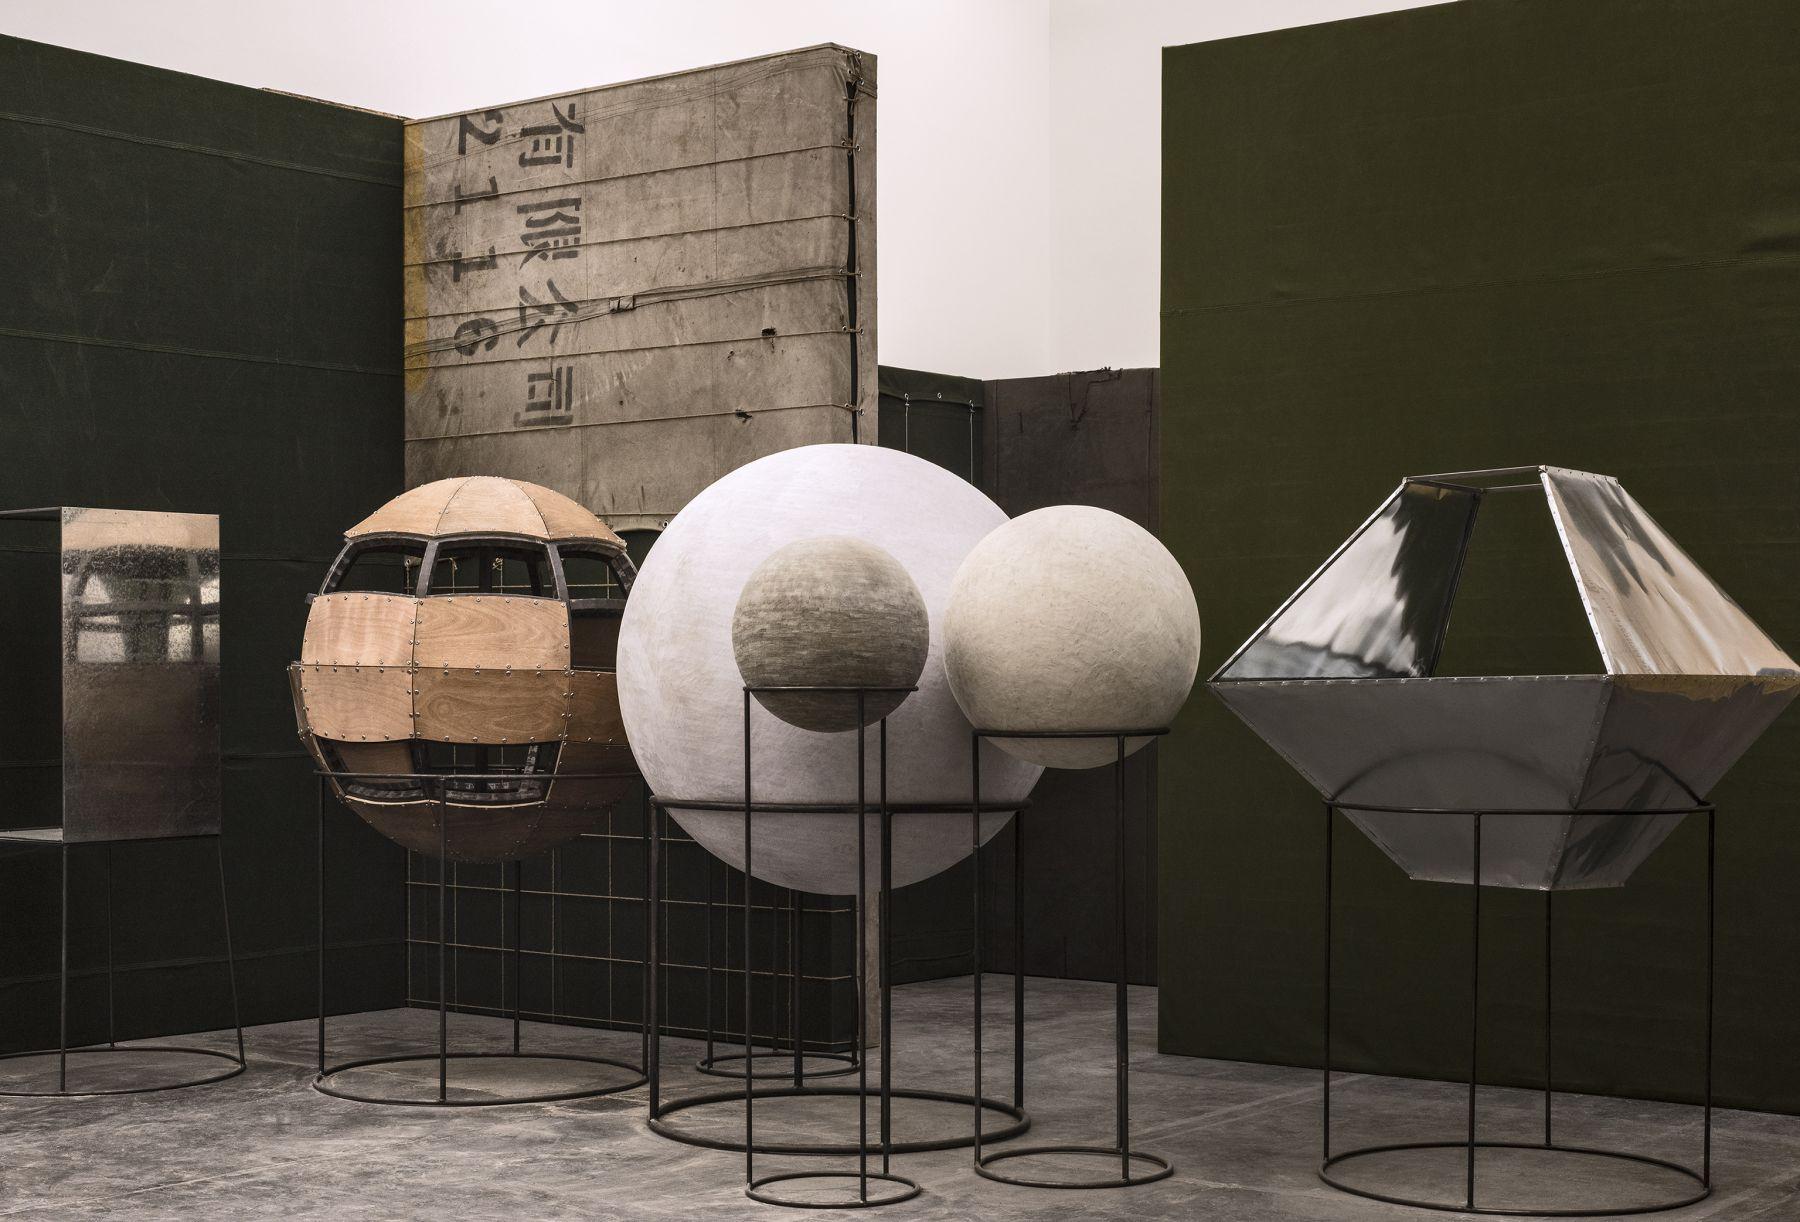 Liu Wei, Colors, Installation view, Ullens Center for Contemporary Art, Beijing